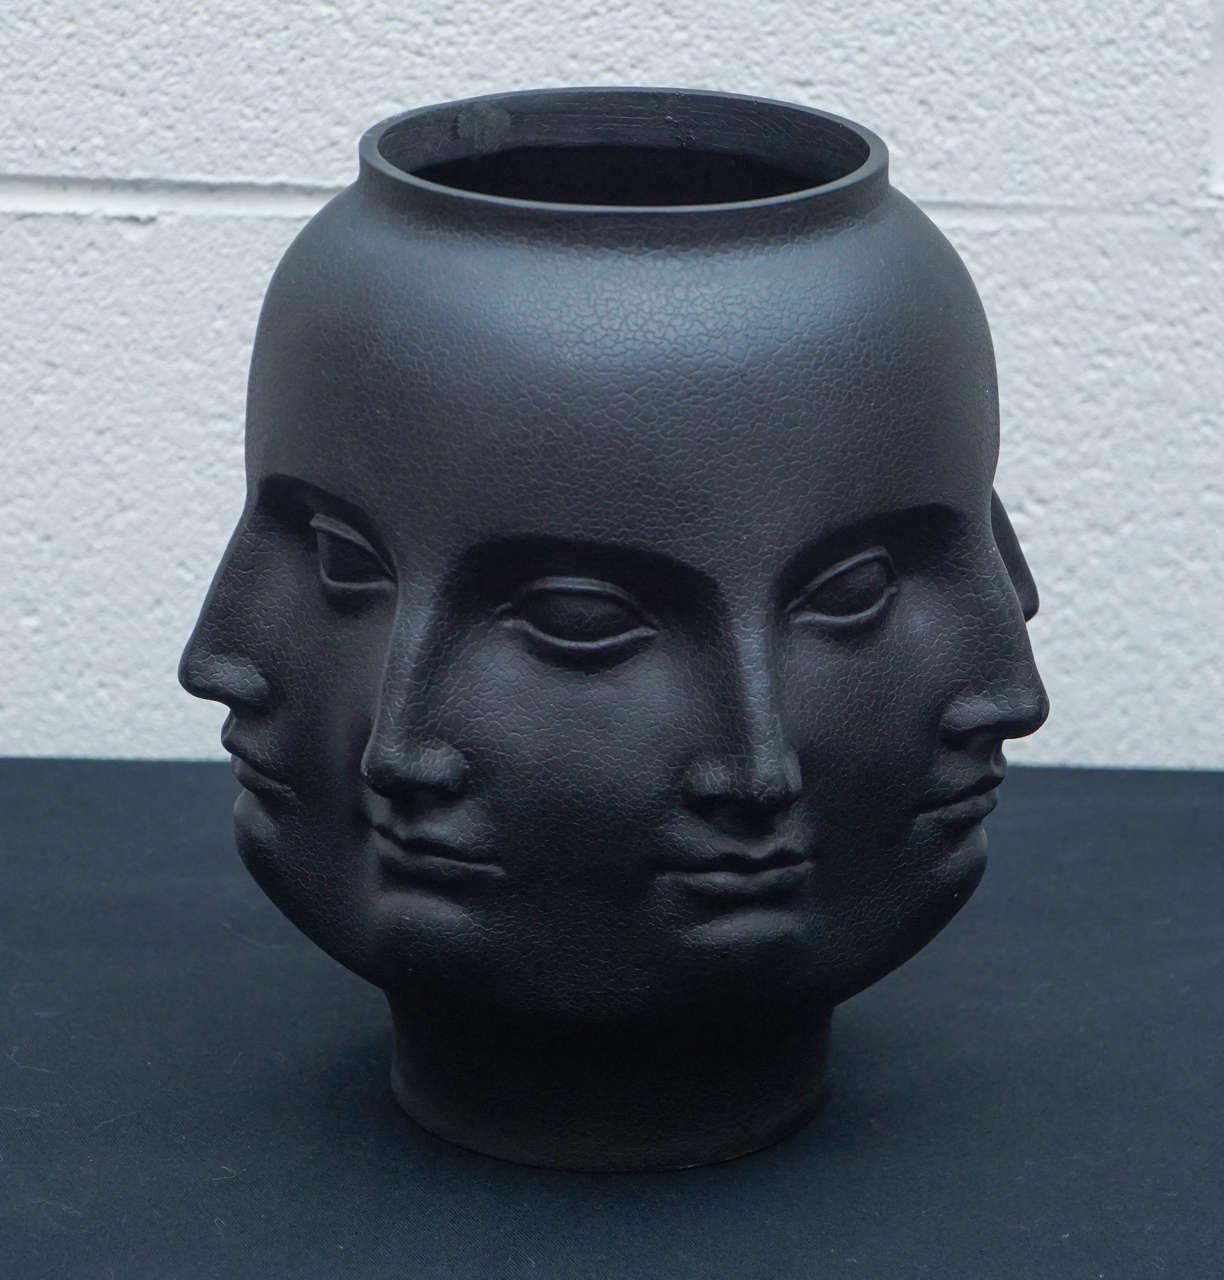 Dora Maar Vase In Black At 1stdibs